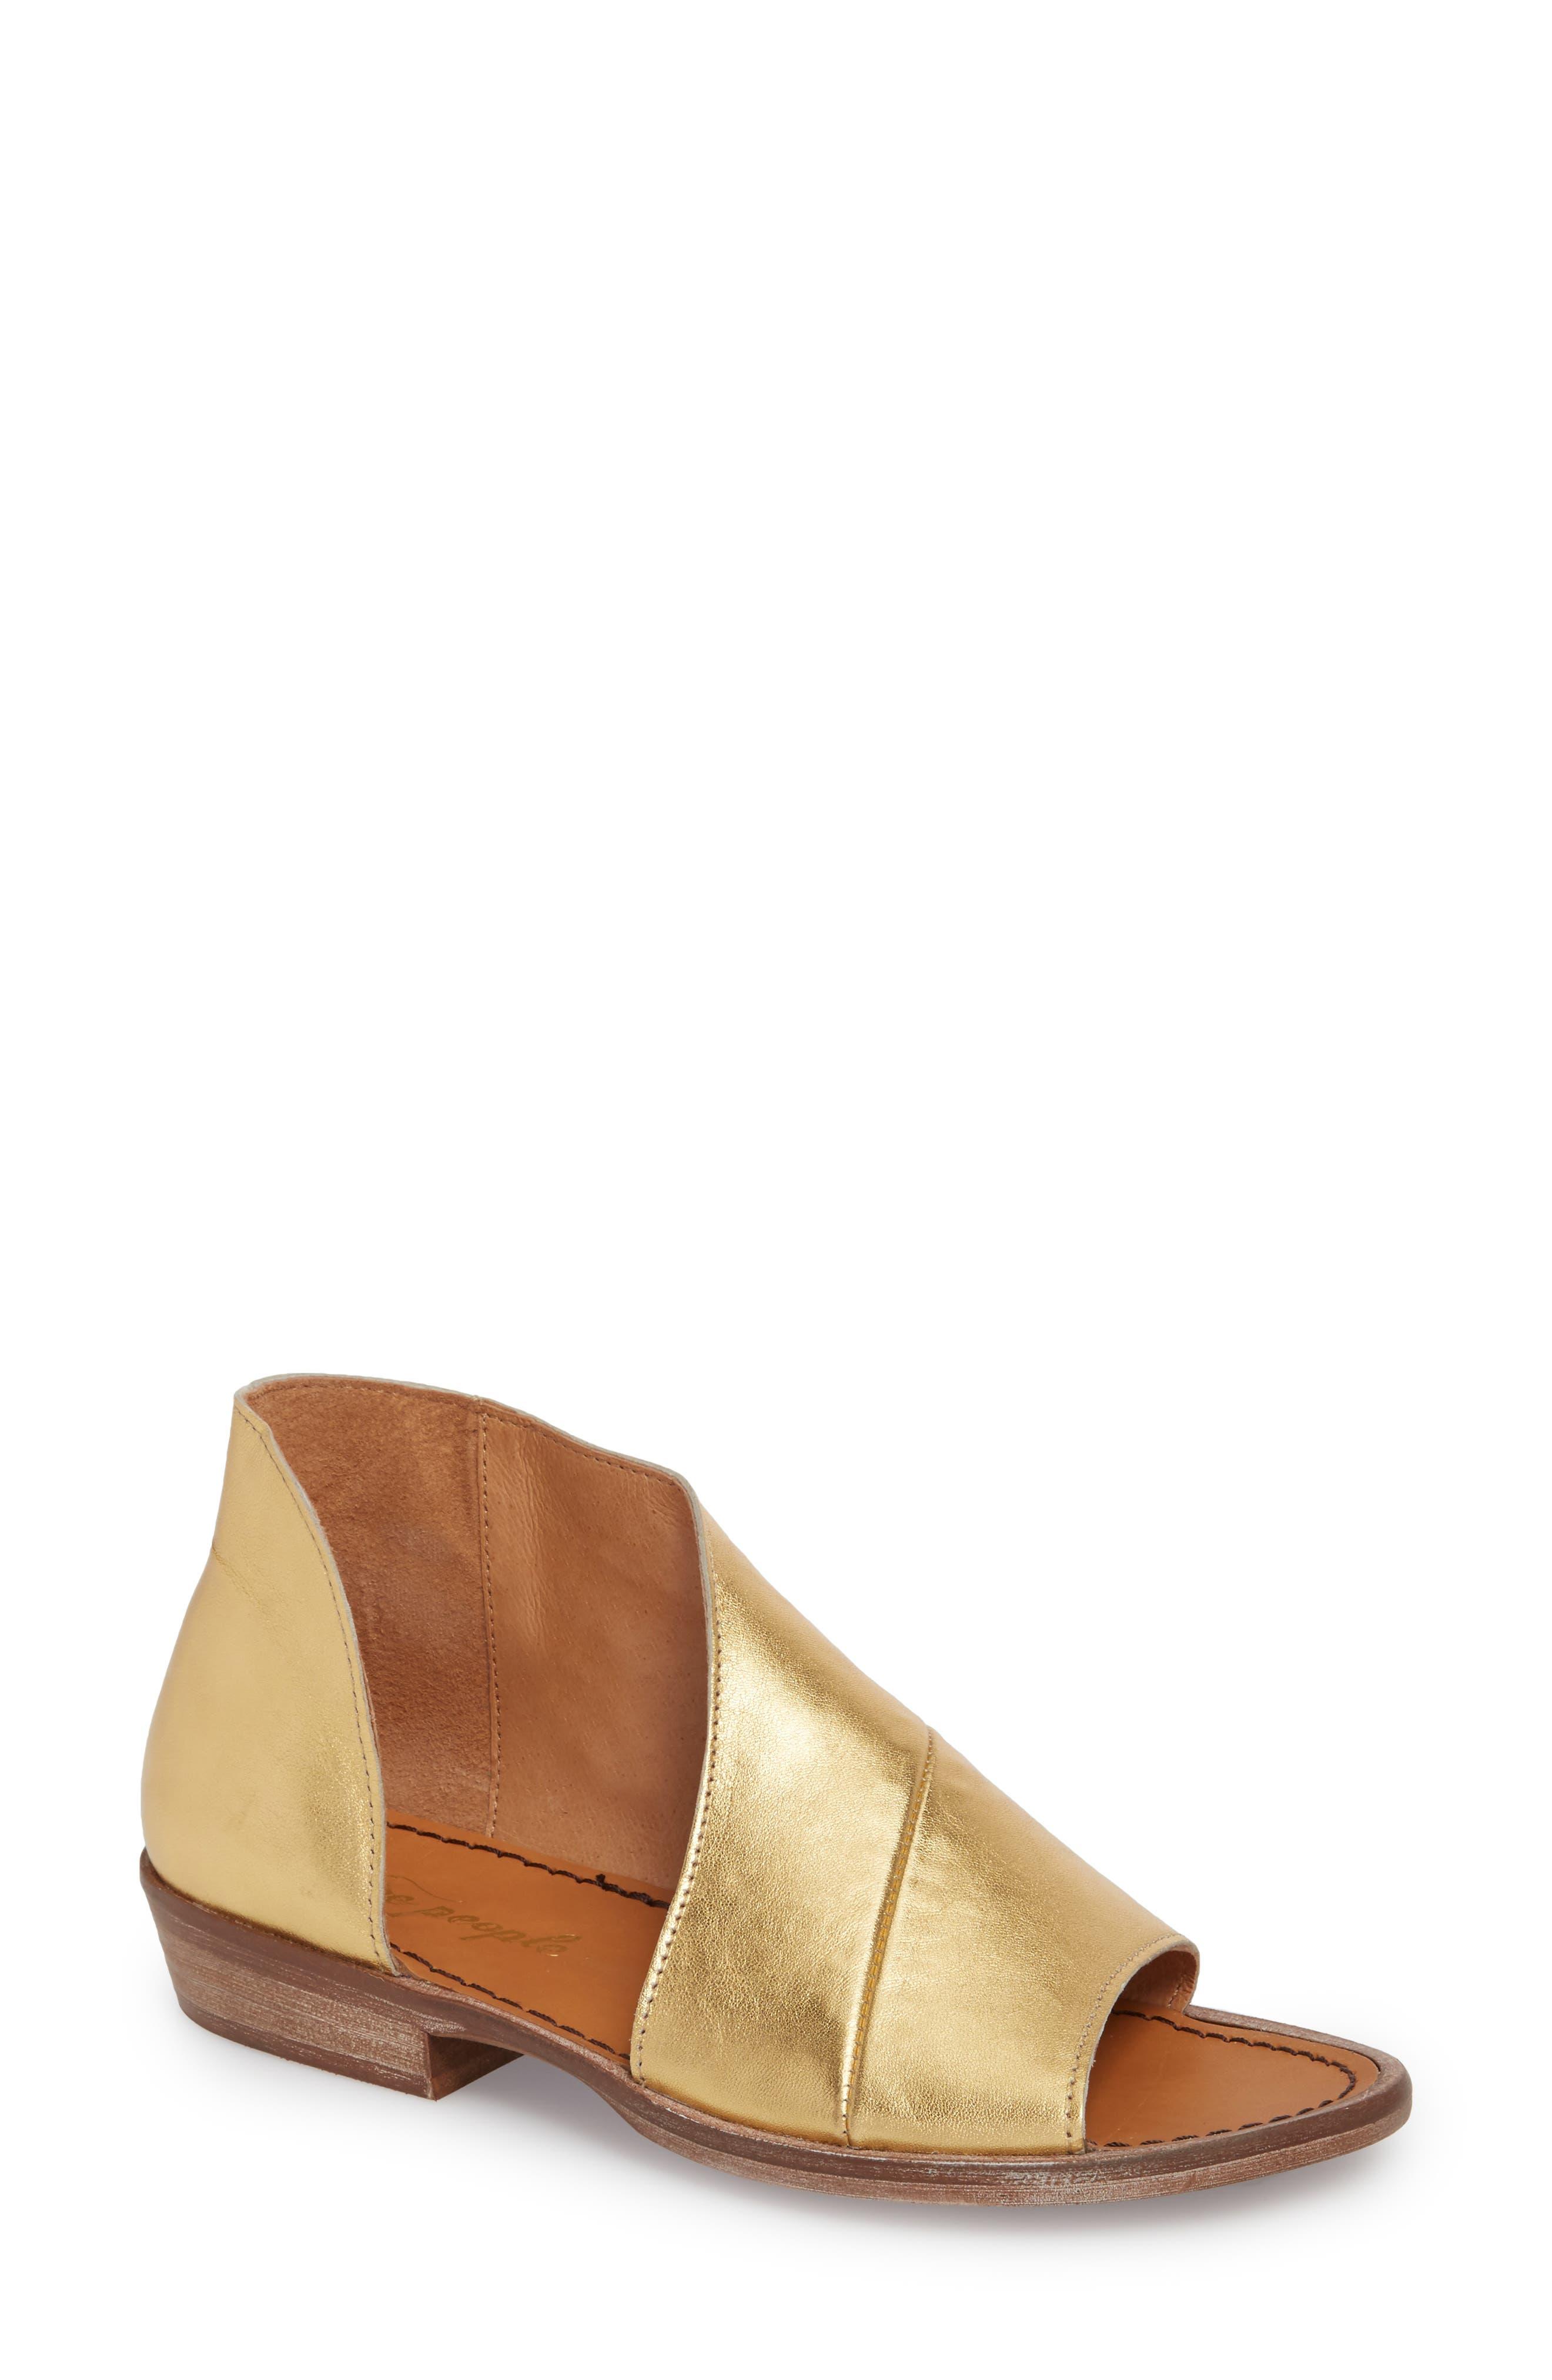 'Mont Blanc' Asymmetrical Sandal,                             Main thumbnail 6, color,